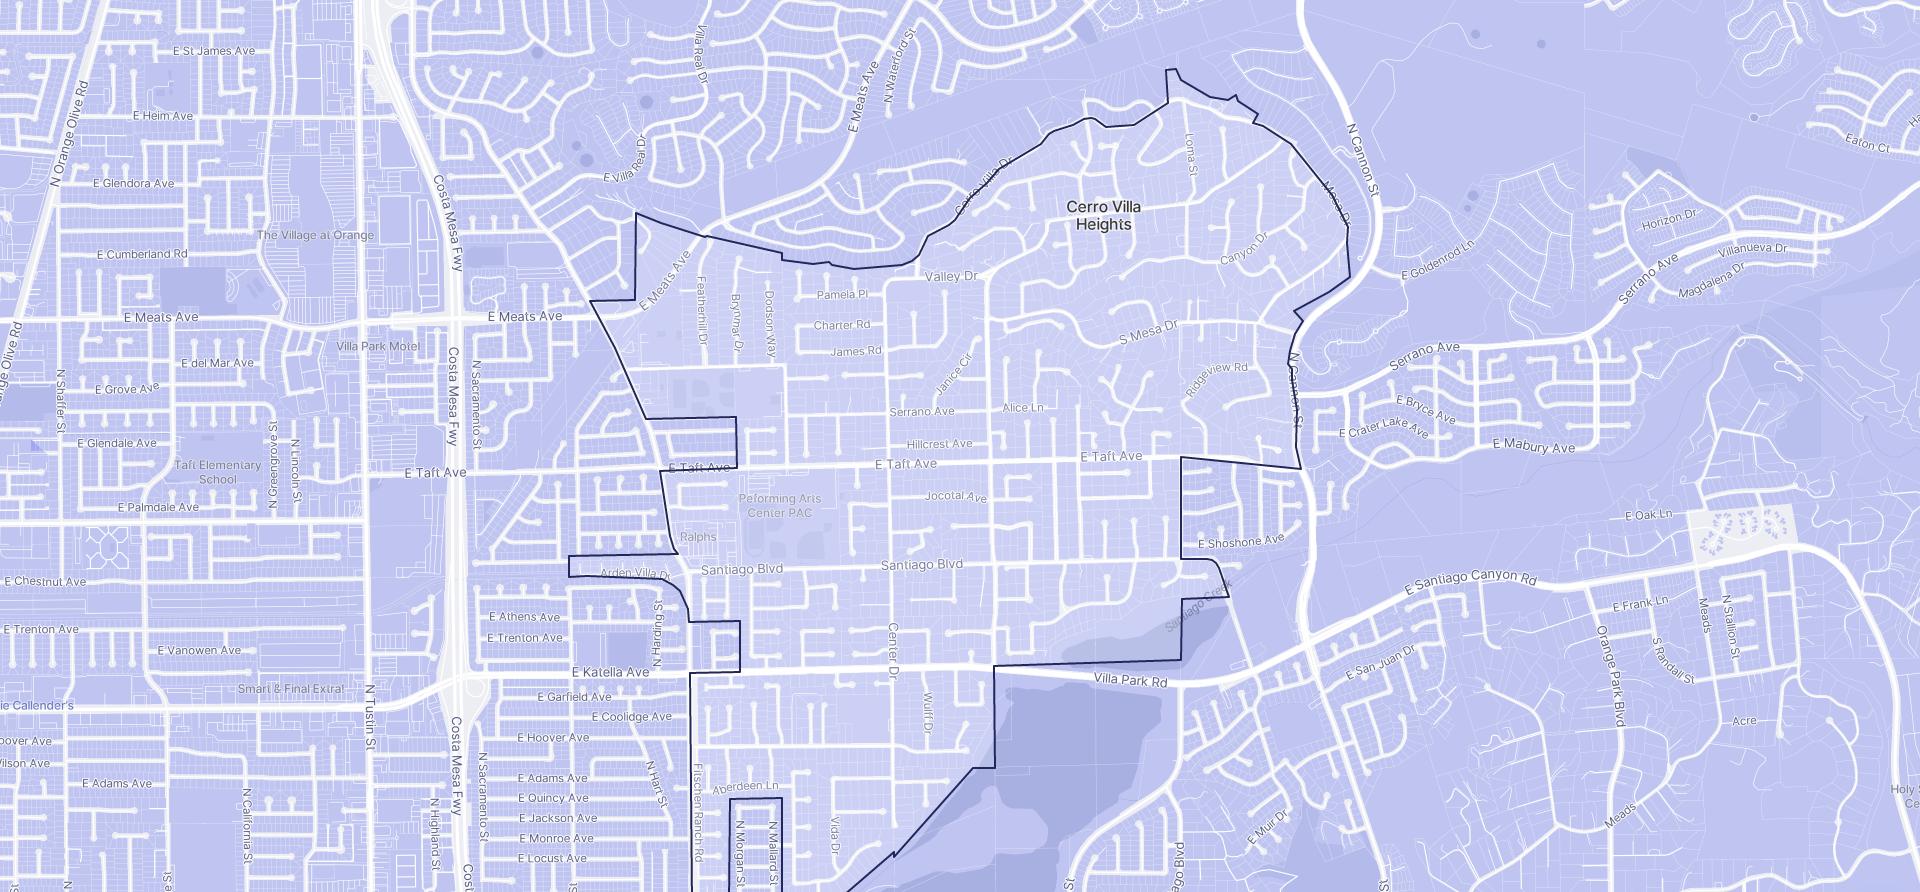 Image of Villa Park boundaries on a map.